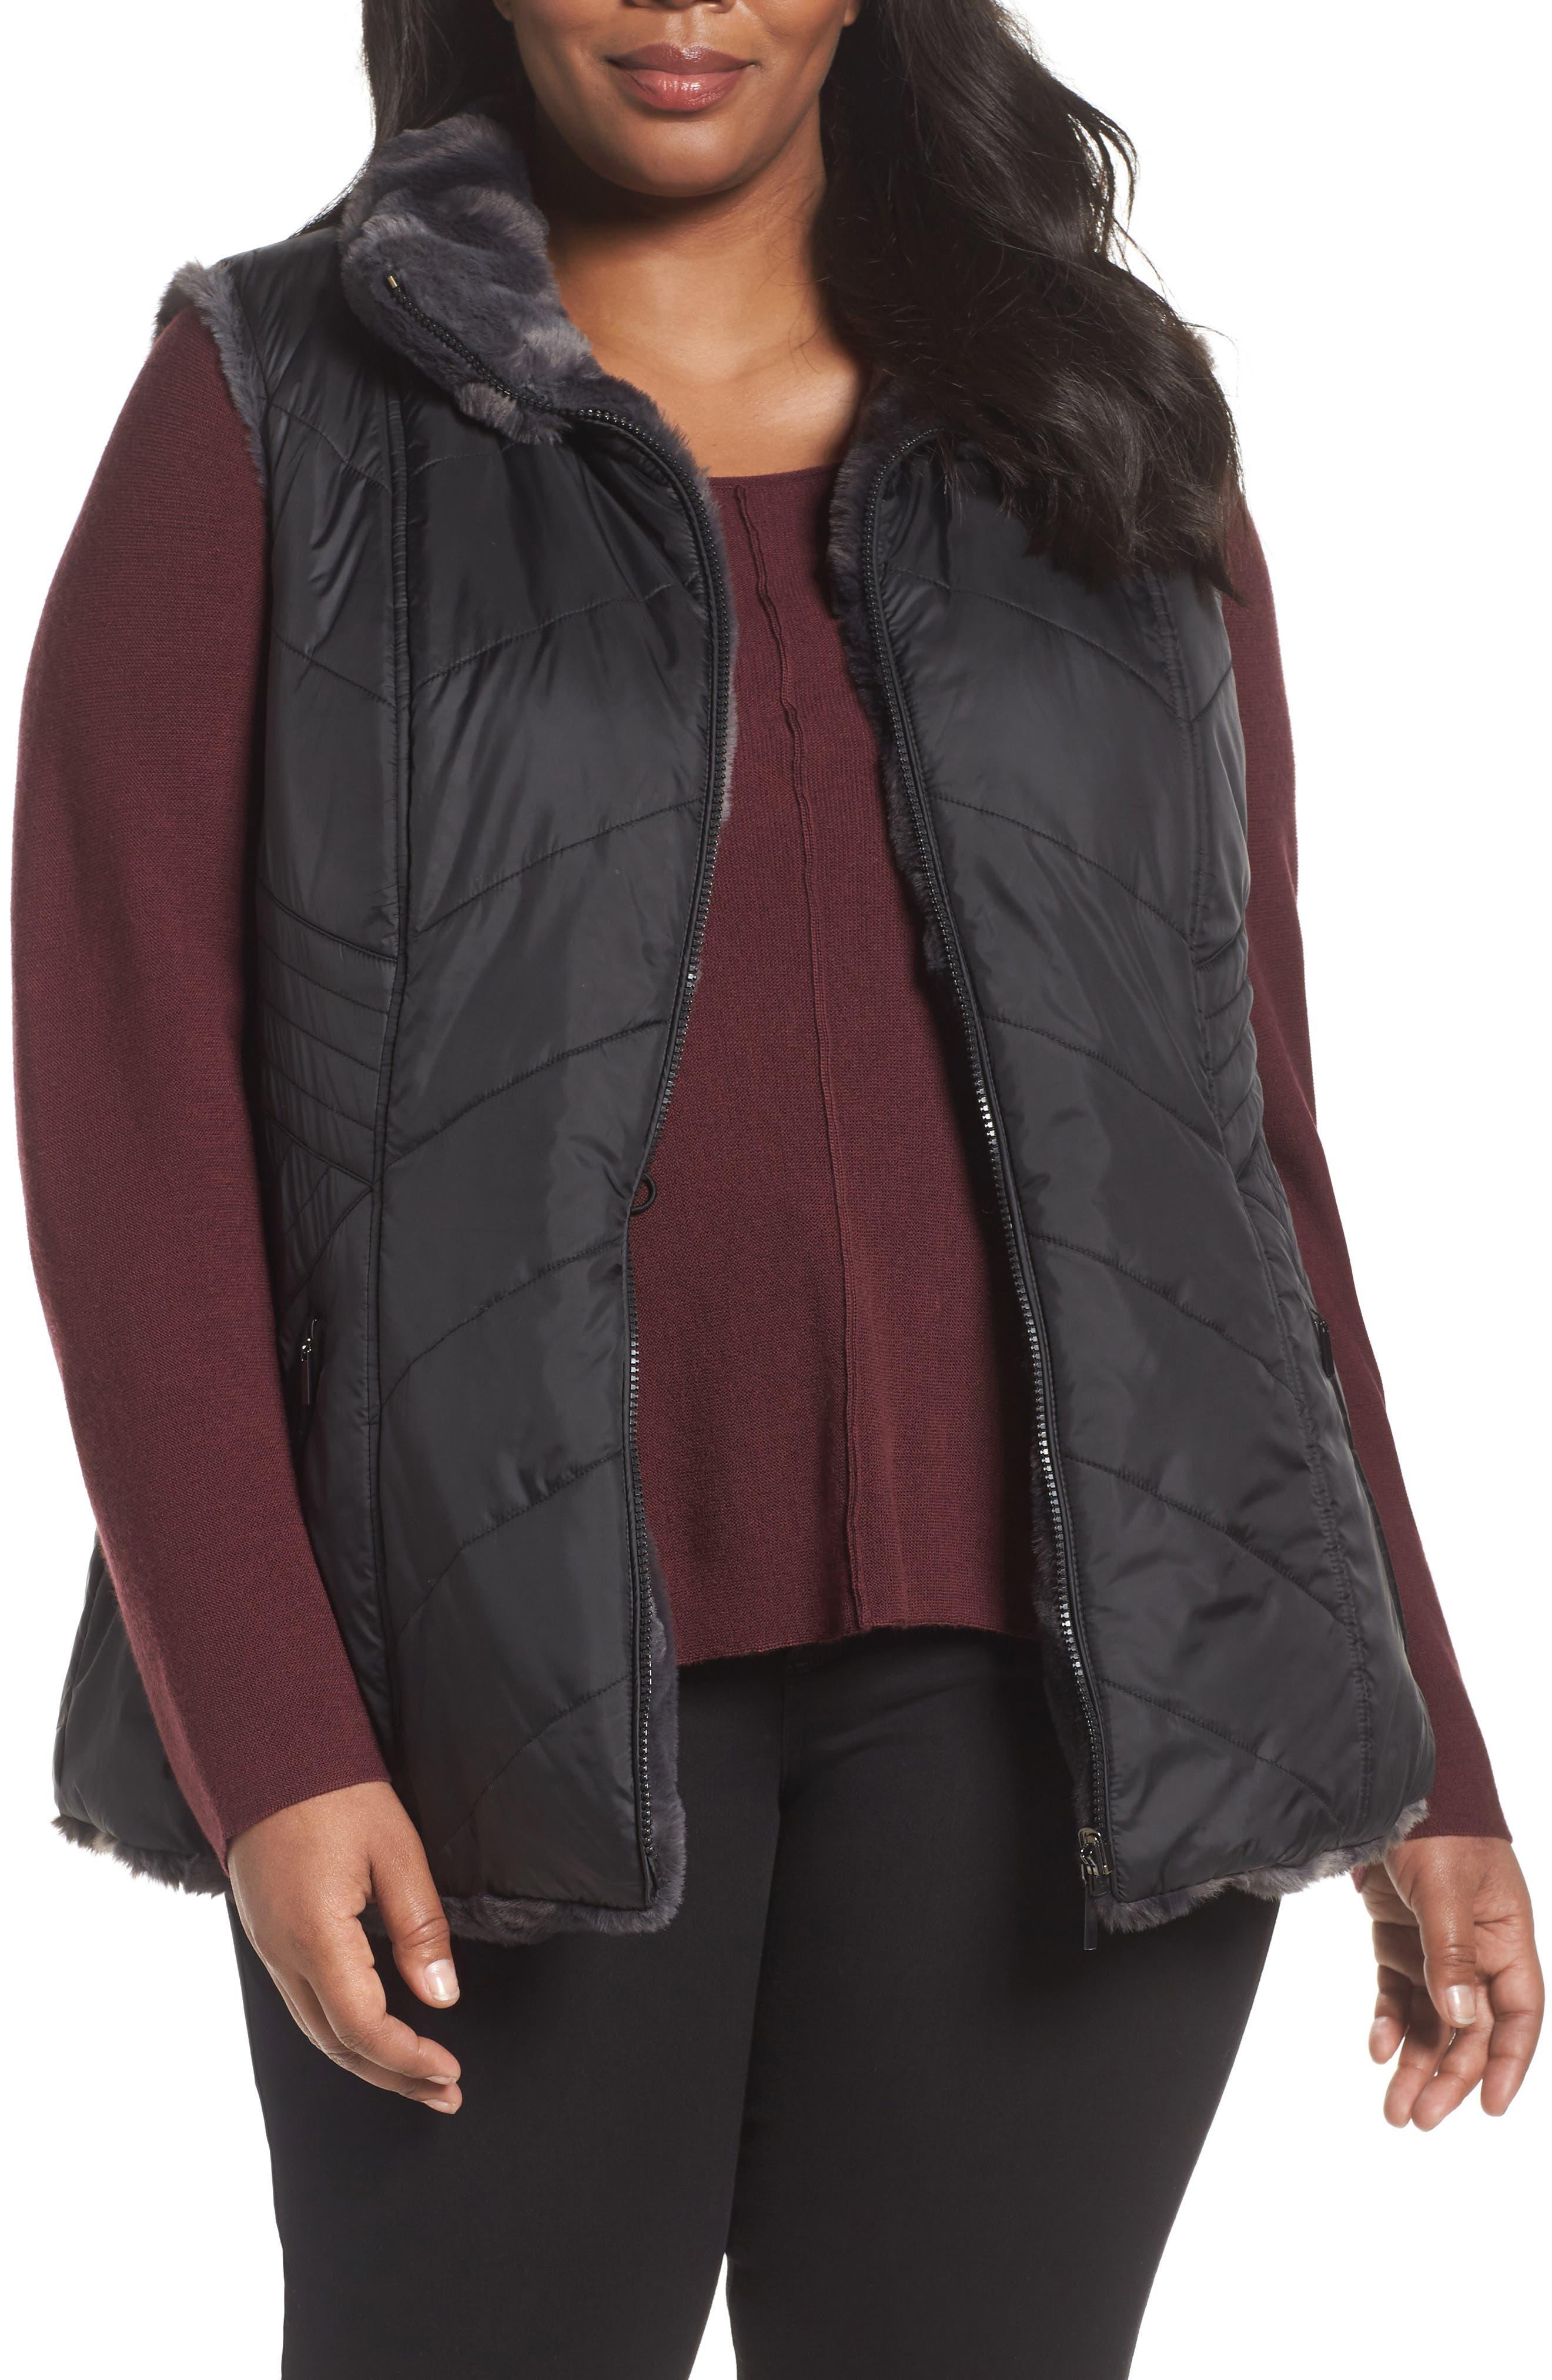 Alternate Image 1 Selected - Gallery Reversible Faux Fur Vest (Plus Size)